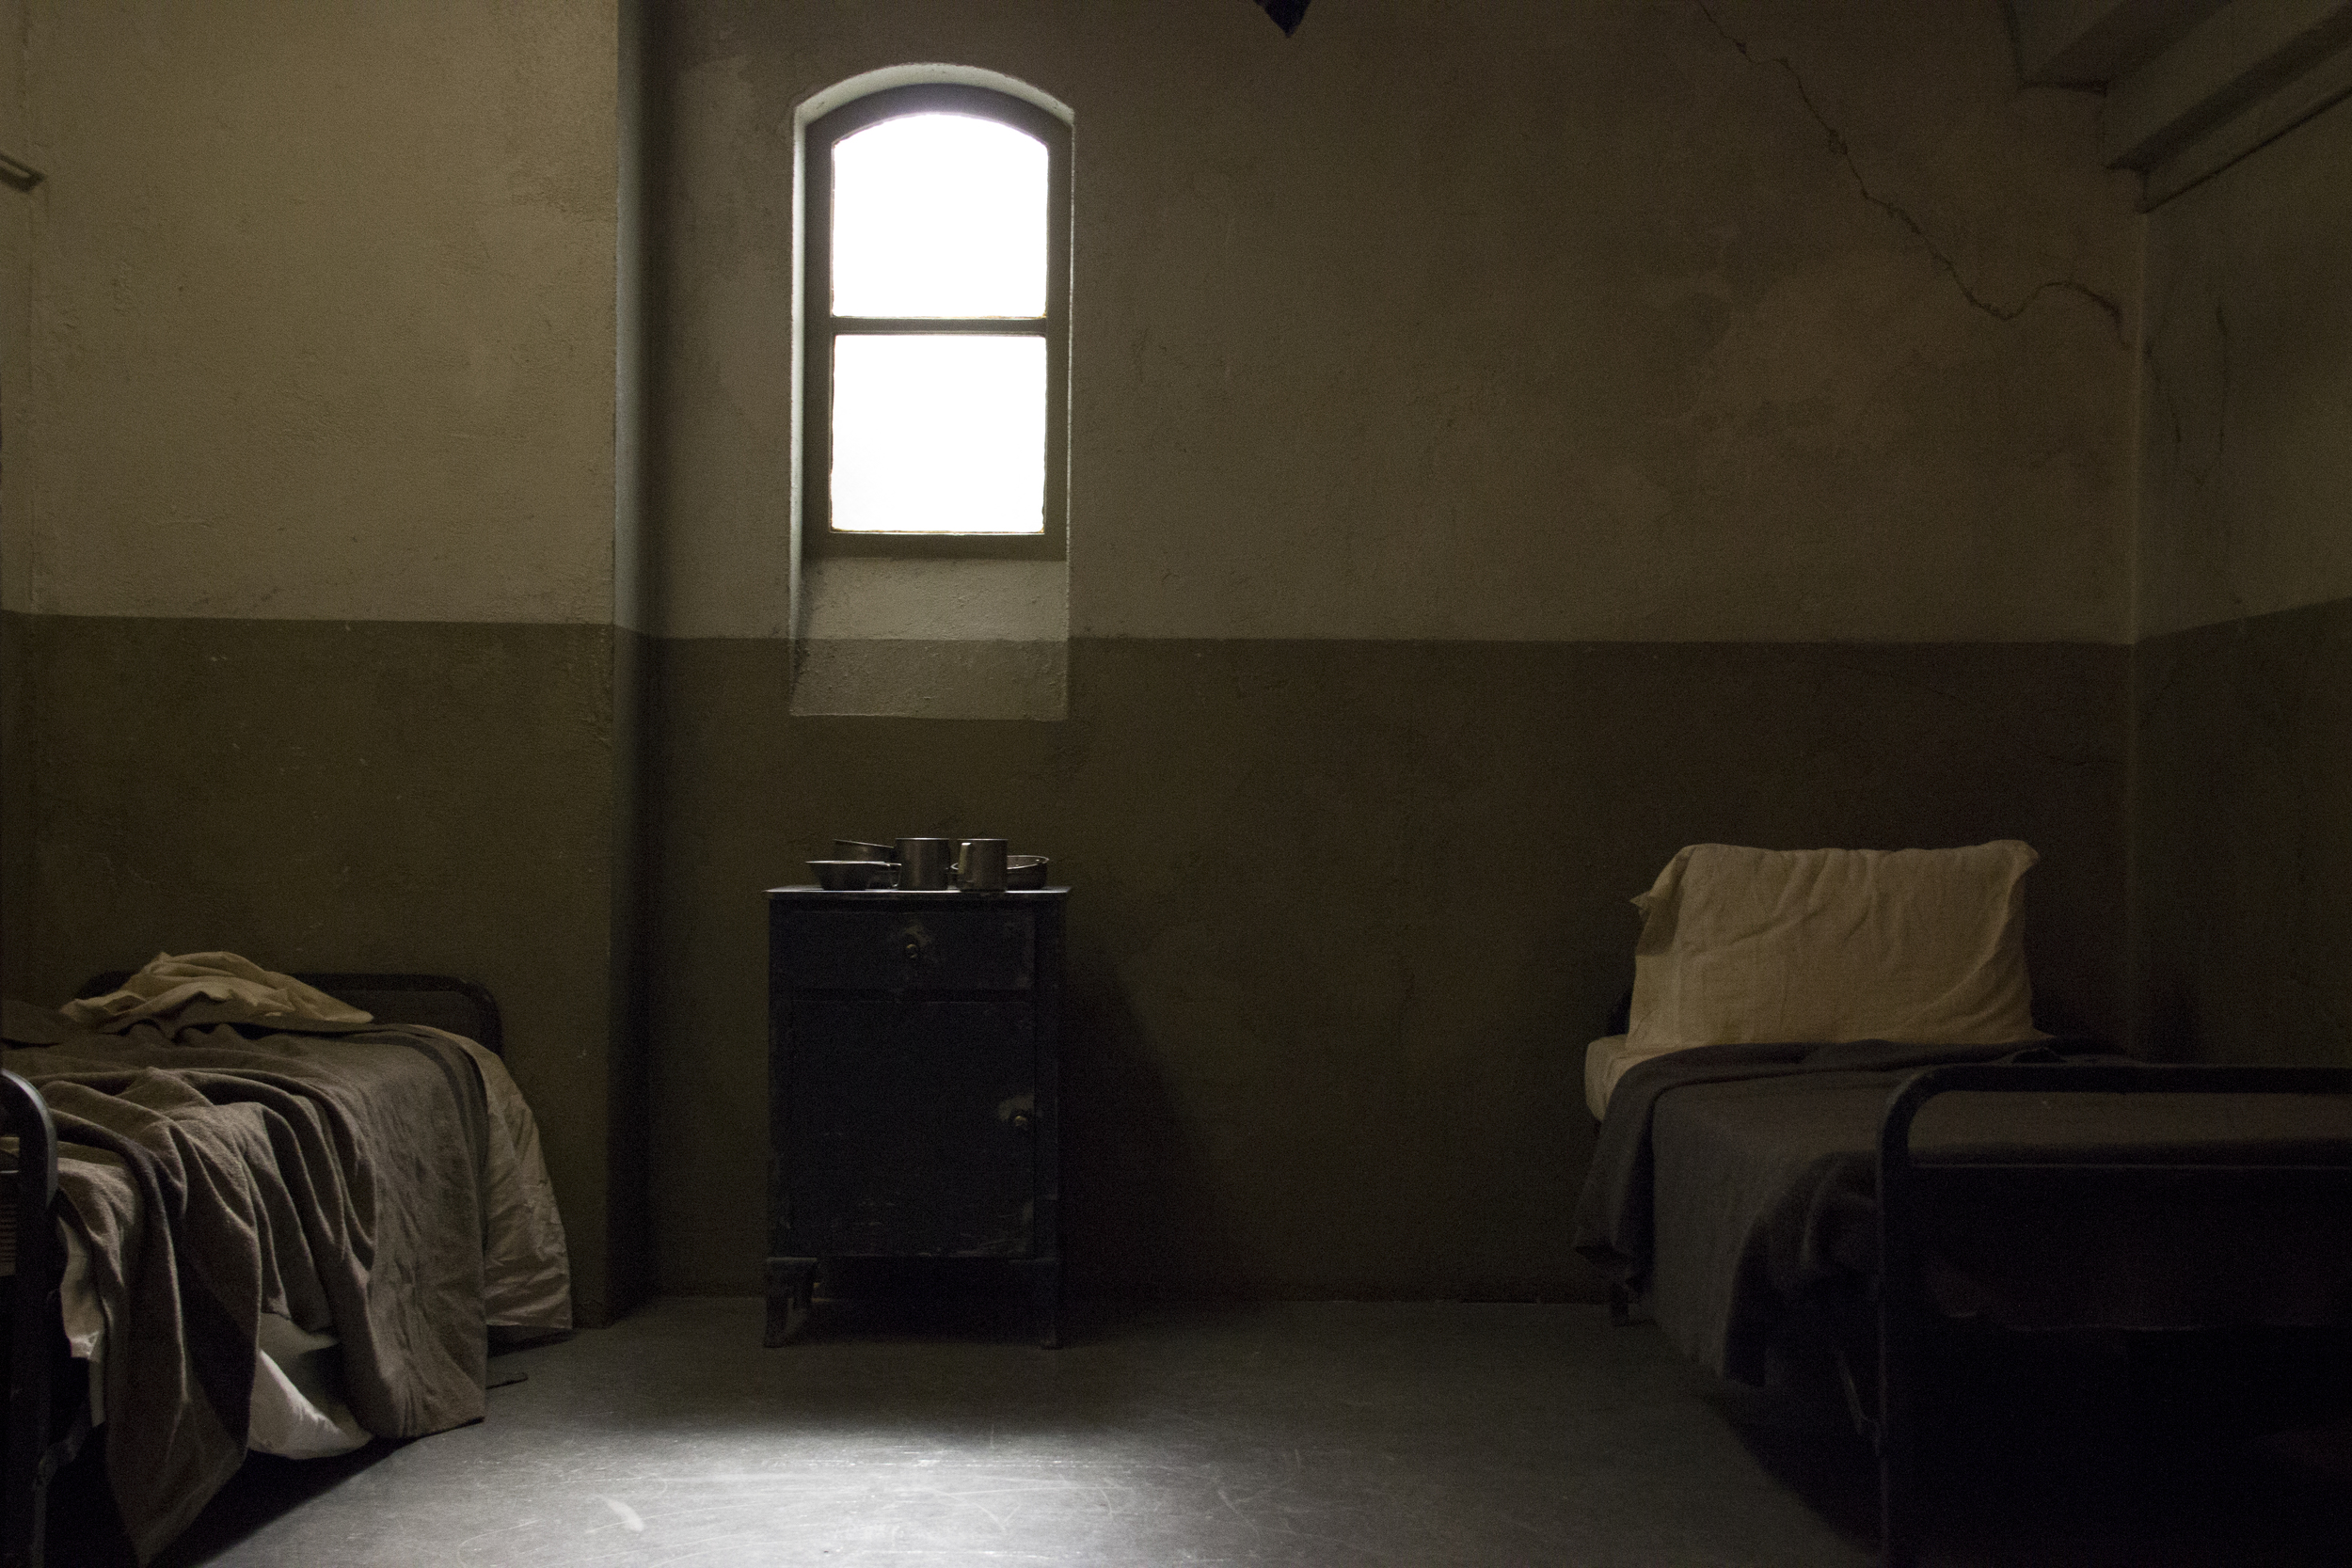 20 prison cell.jpg